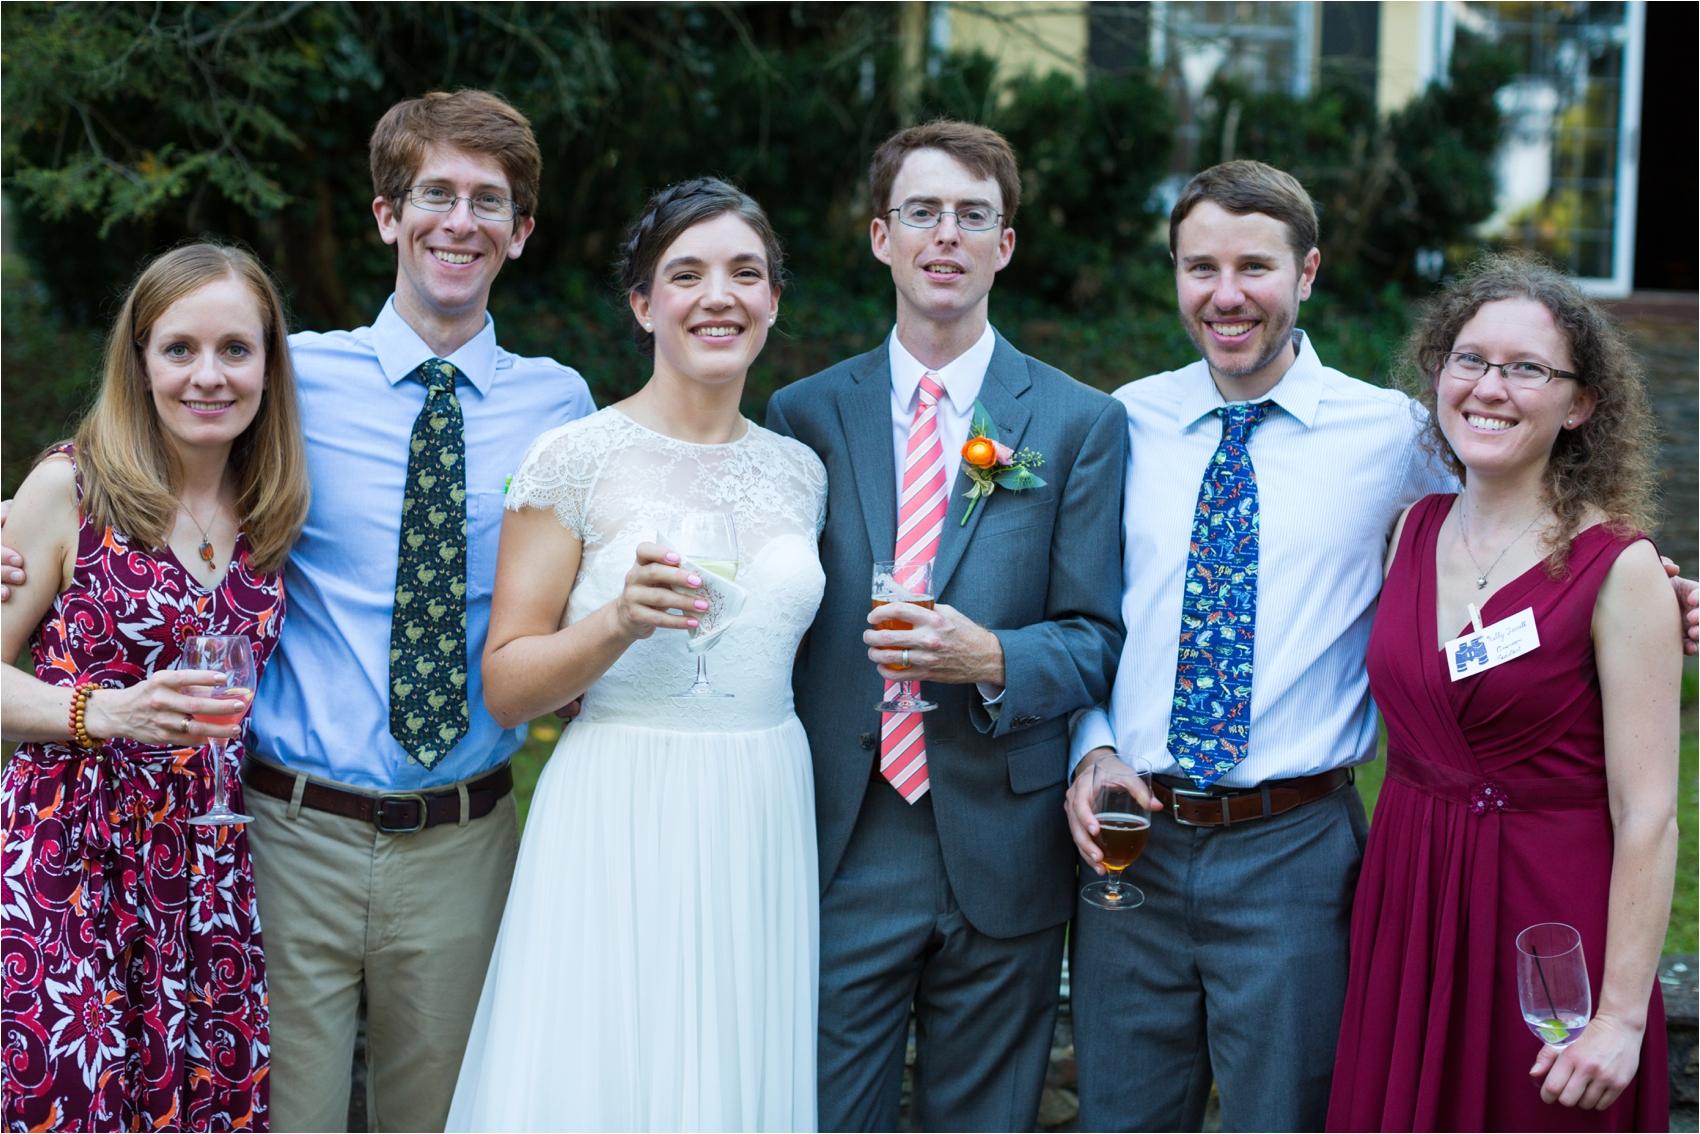 Feather-and-Oak-Rainforest-Trust-Virginia-Wedding-3963.jpg